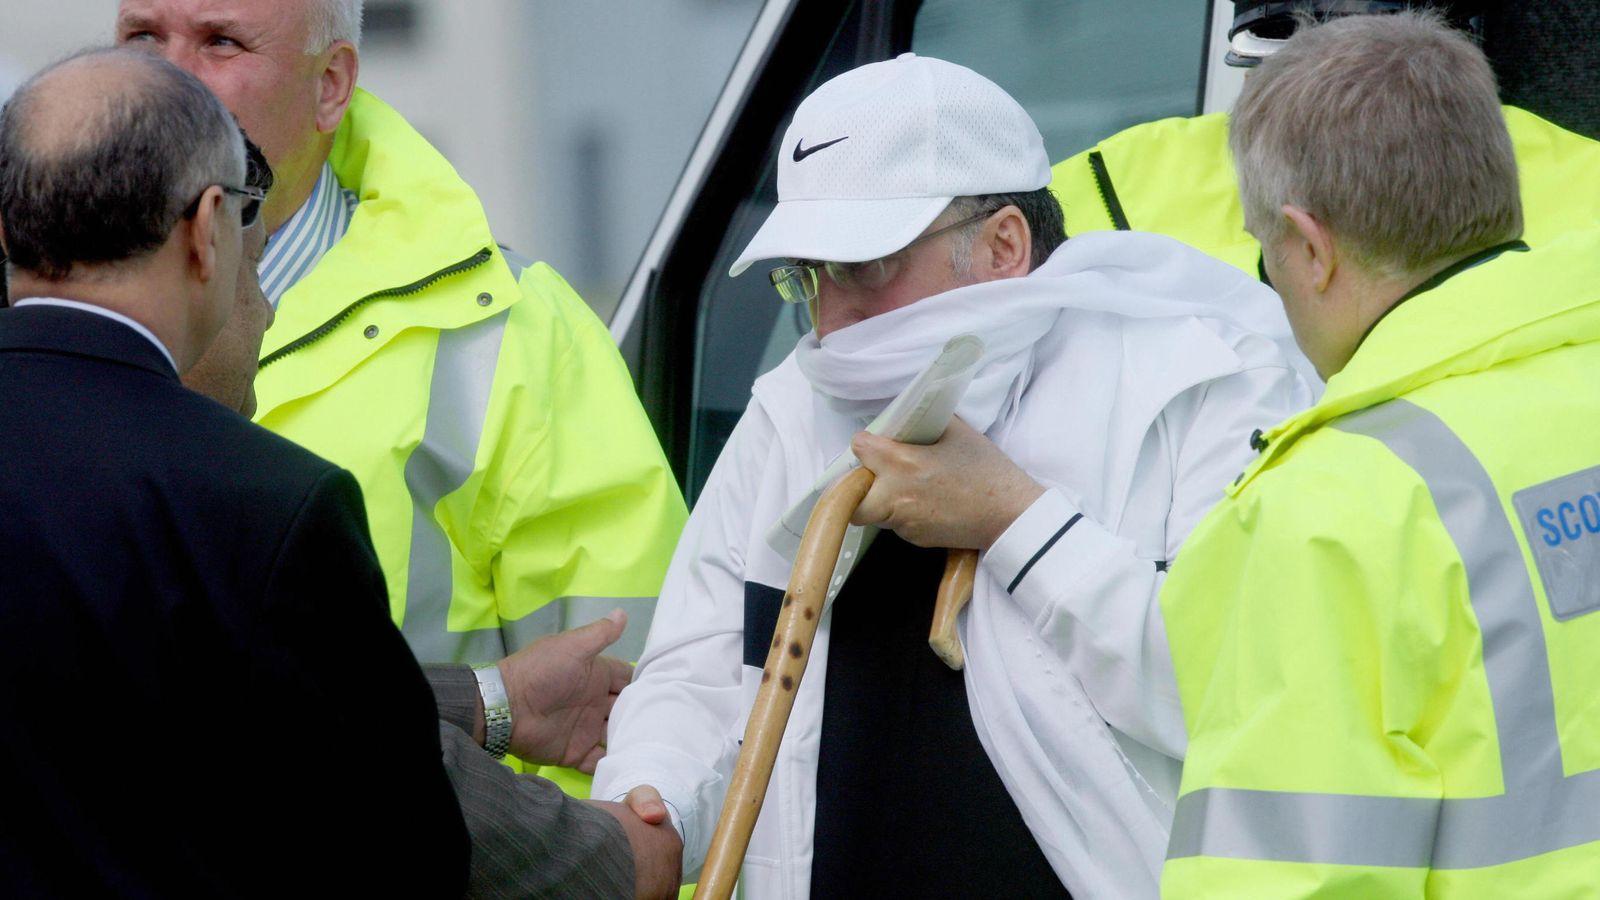 Lockerbie bomber Abdelbaset Ali al-Megrahi arrives at Glasgow airport